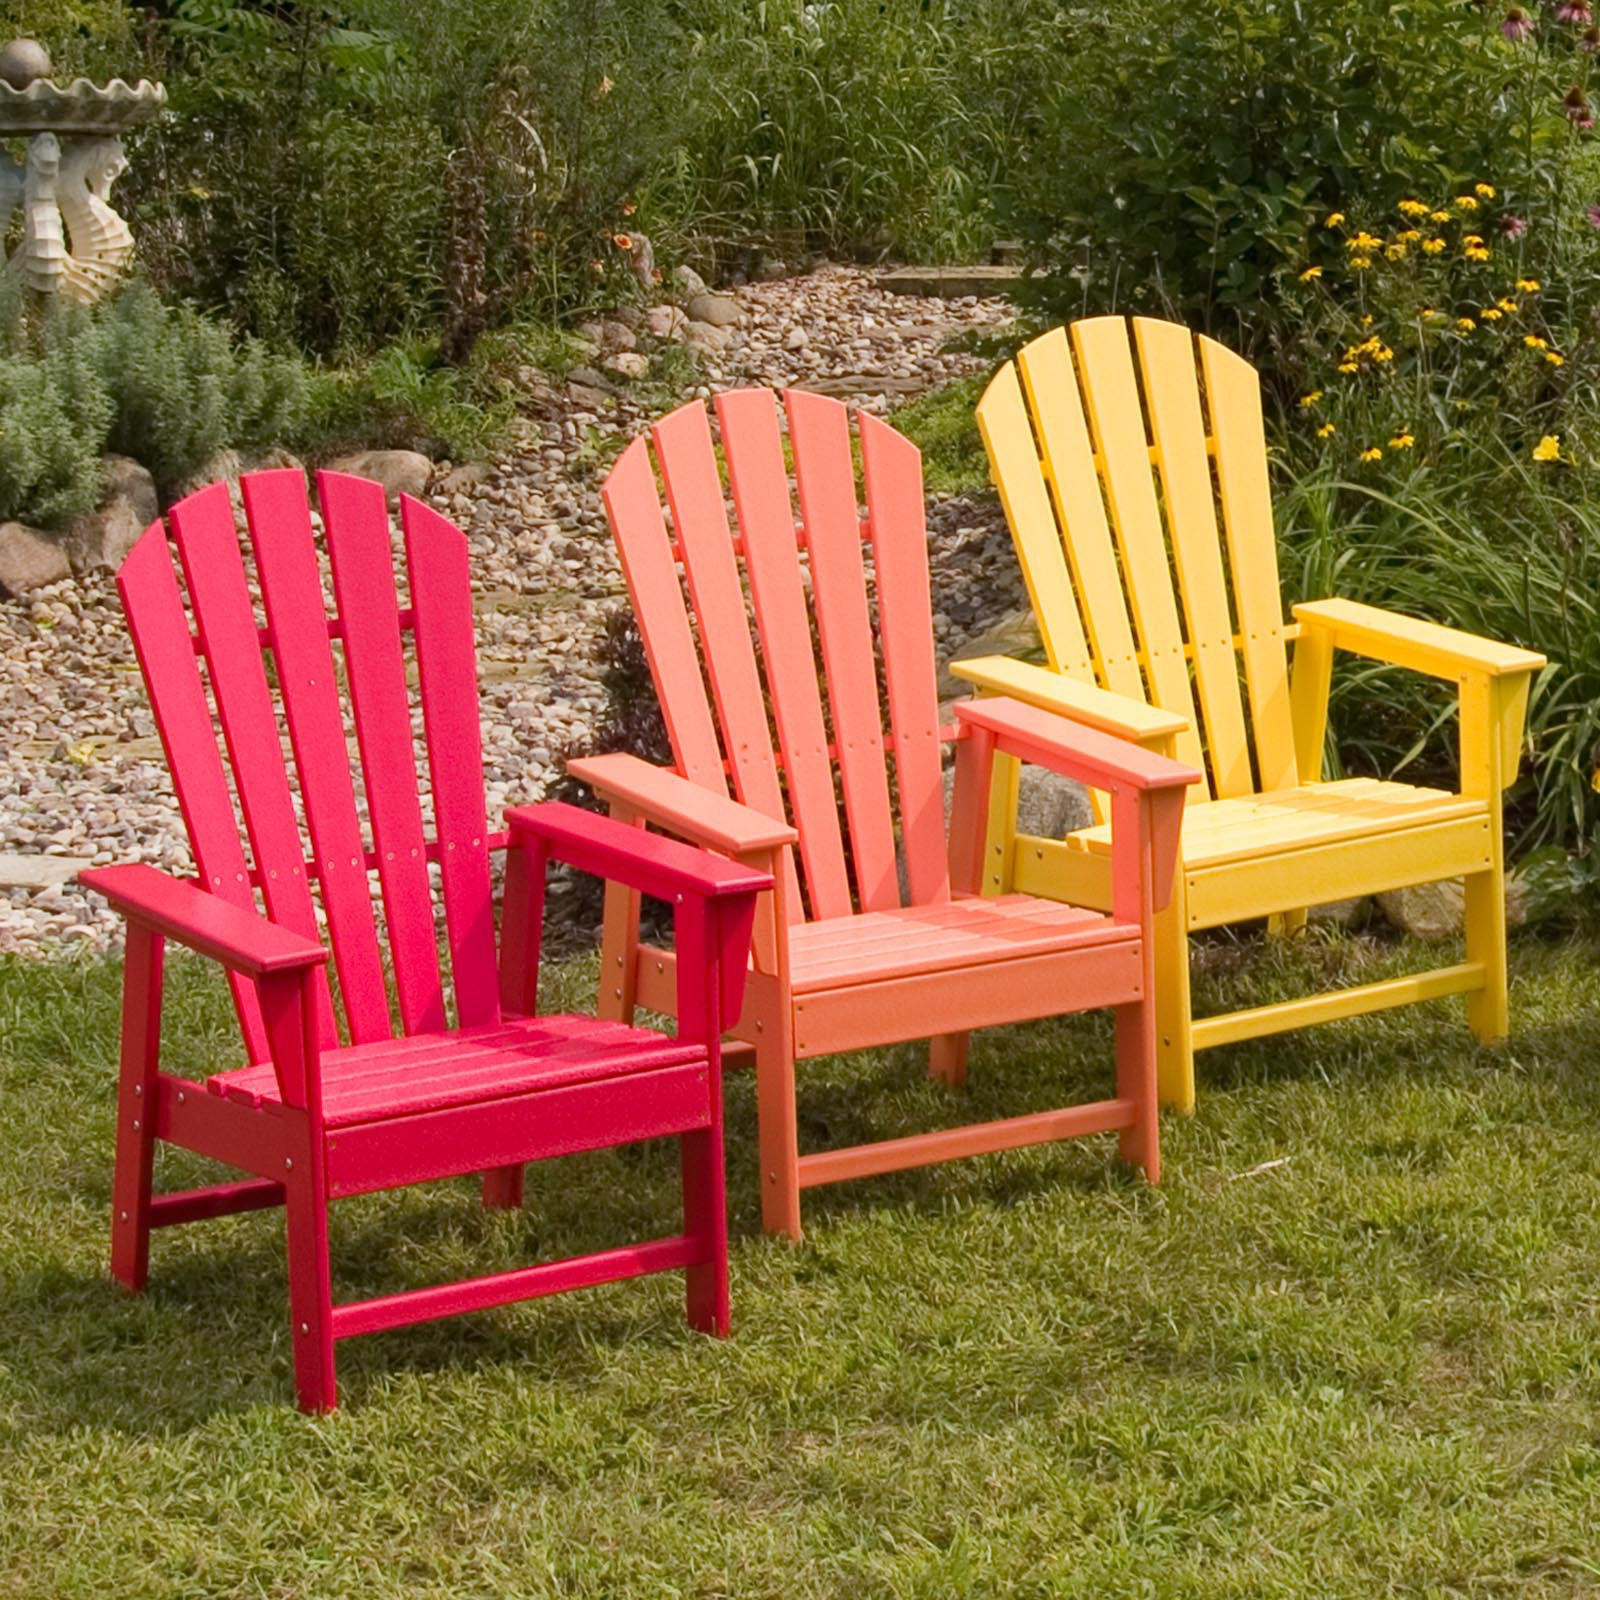 POLYWOODu0026reg; South Beach Recycled Plastic Adirondack Chair   26.5W X 29D X  42.5H In.   Walmart.com